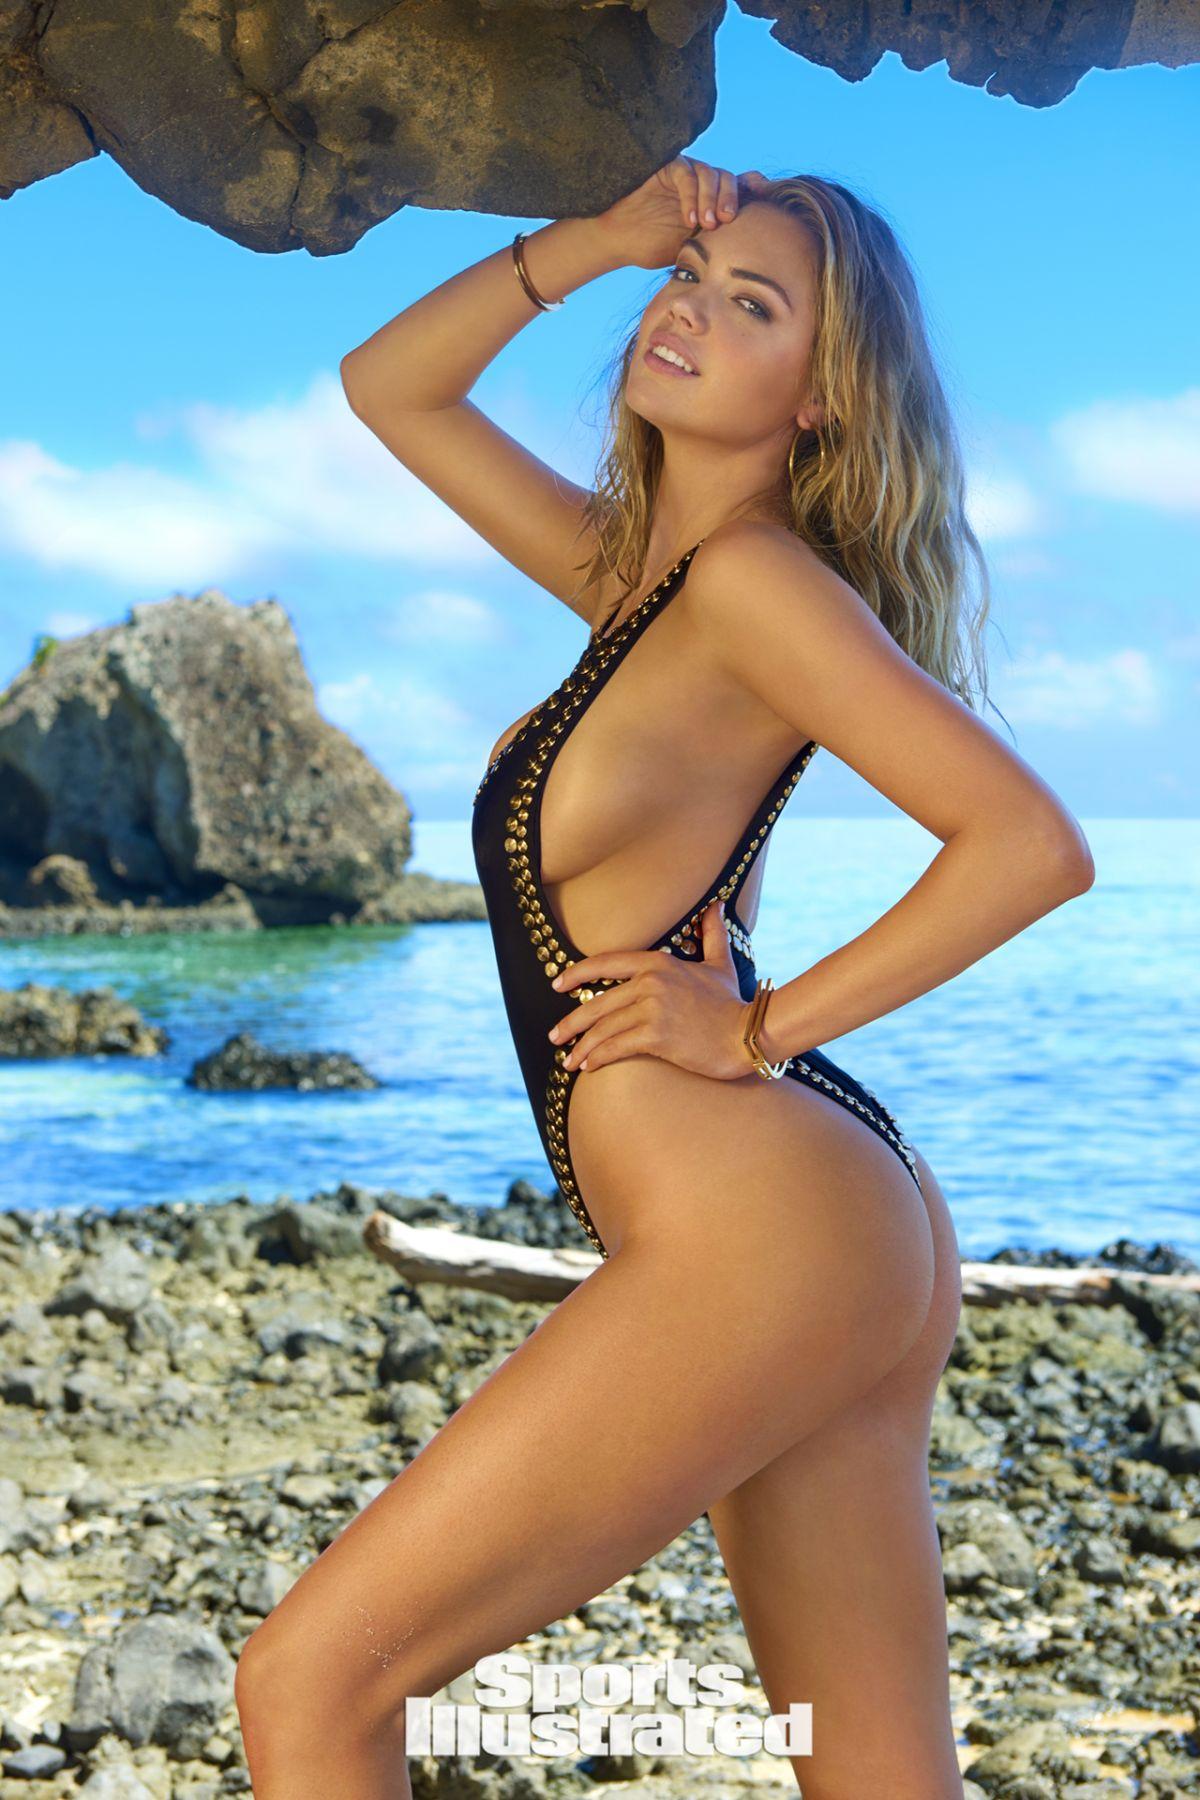 upton swimsuit wallpaper - photo #27